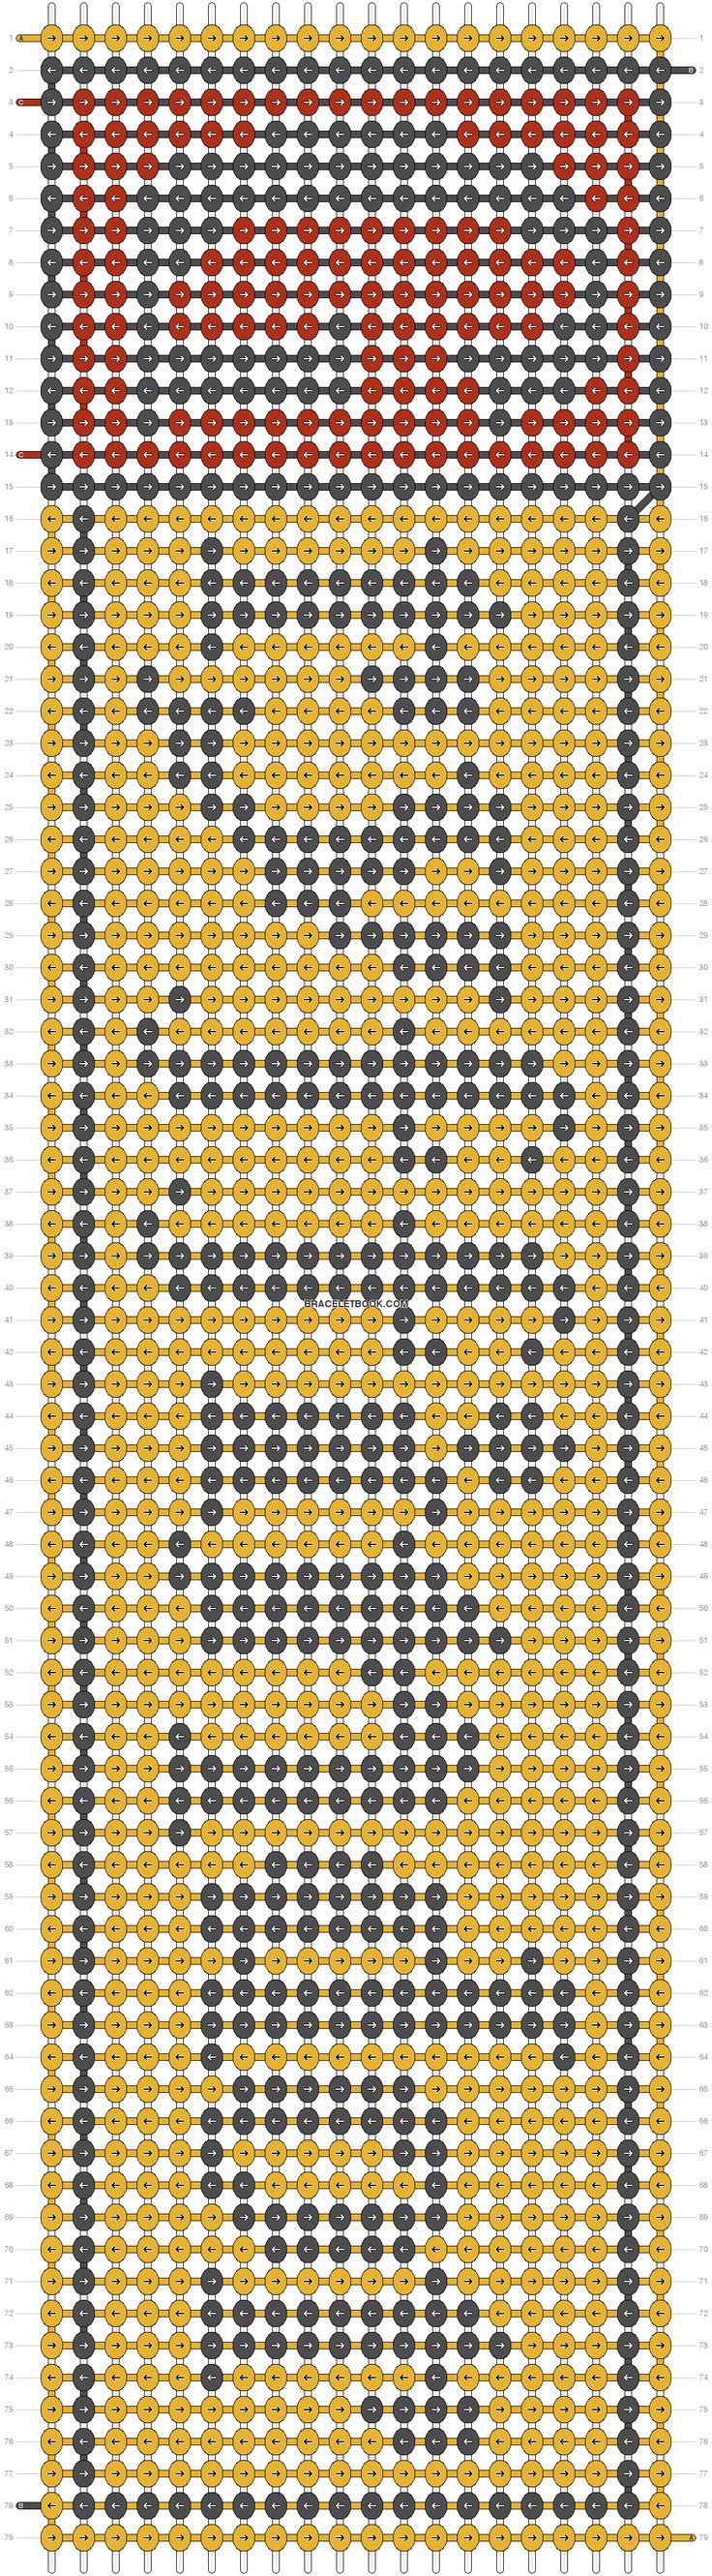 Alpha Pattern #10846 added by blueisbest | Gryffindor Hogwarts House - Harry Potter Friendship Bracelet